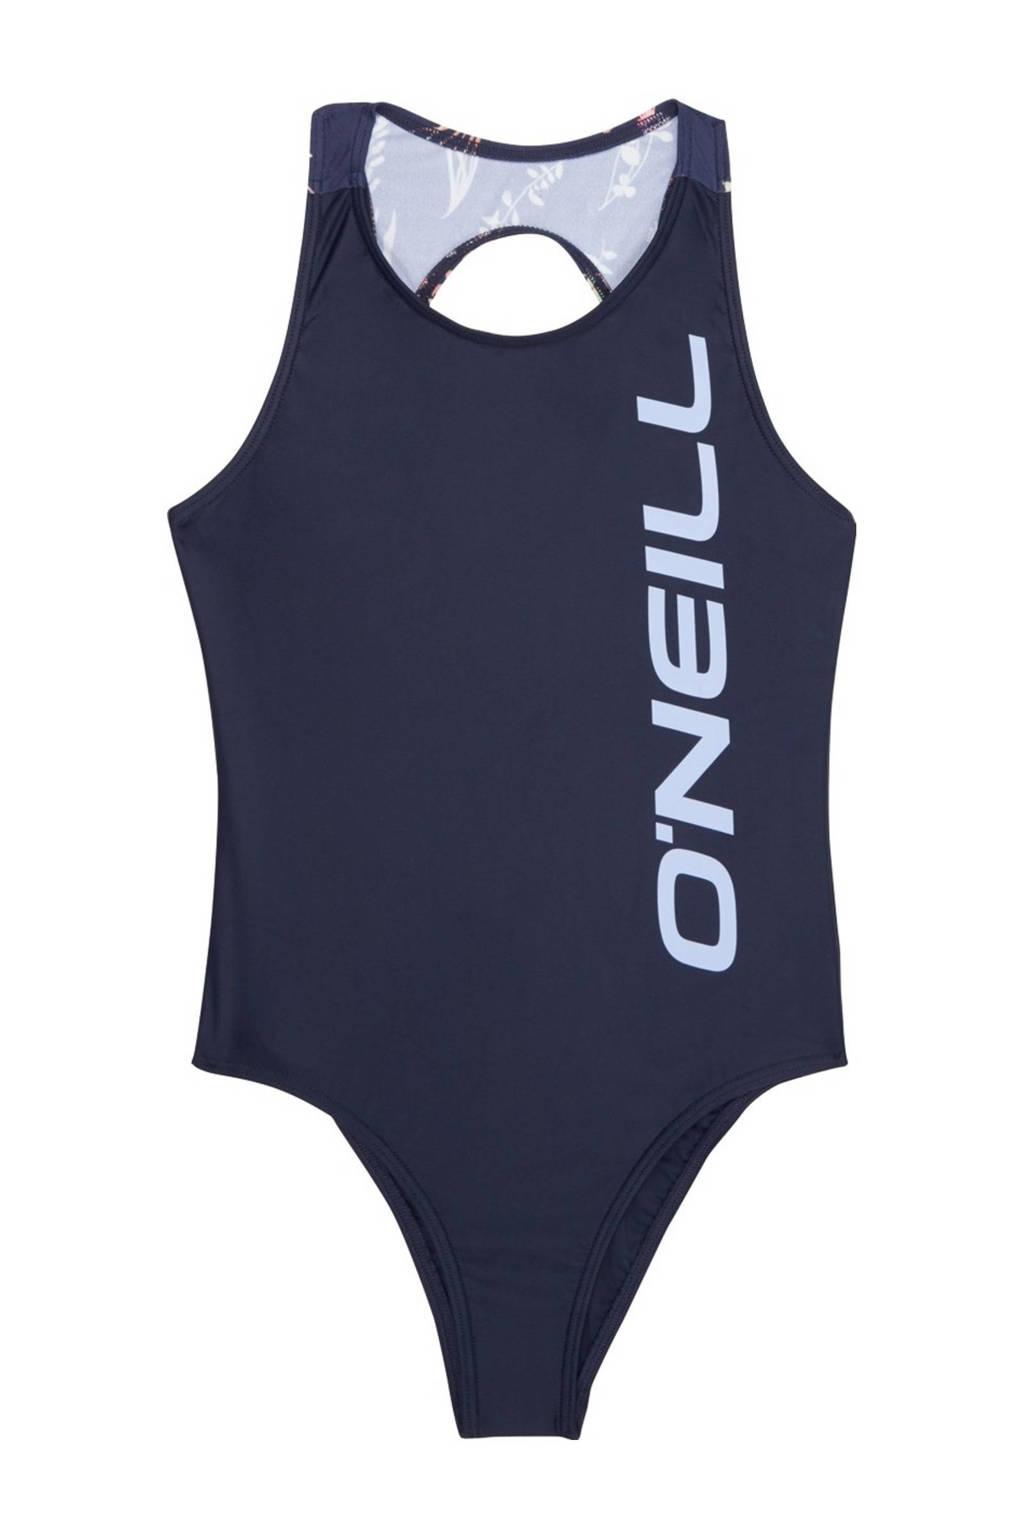 O'Neill badpak Sun & Joy donkerblauw, Blauw